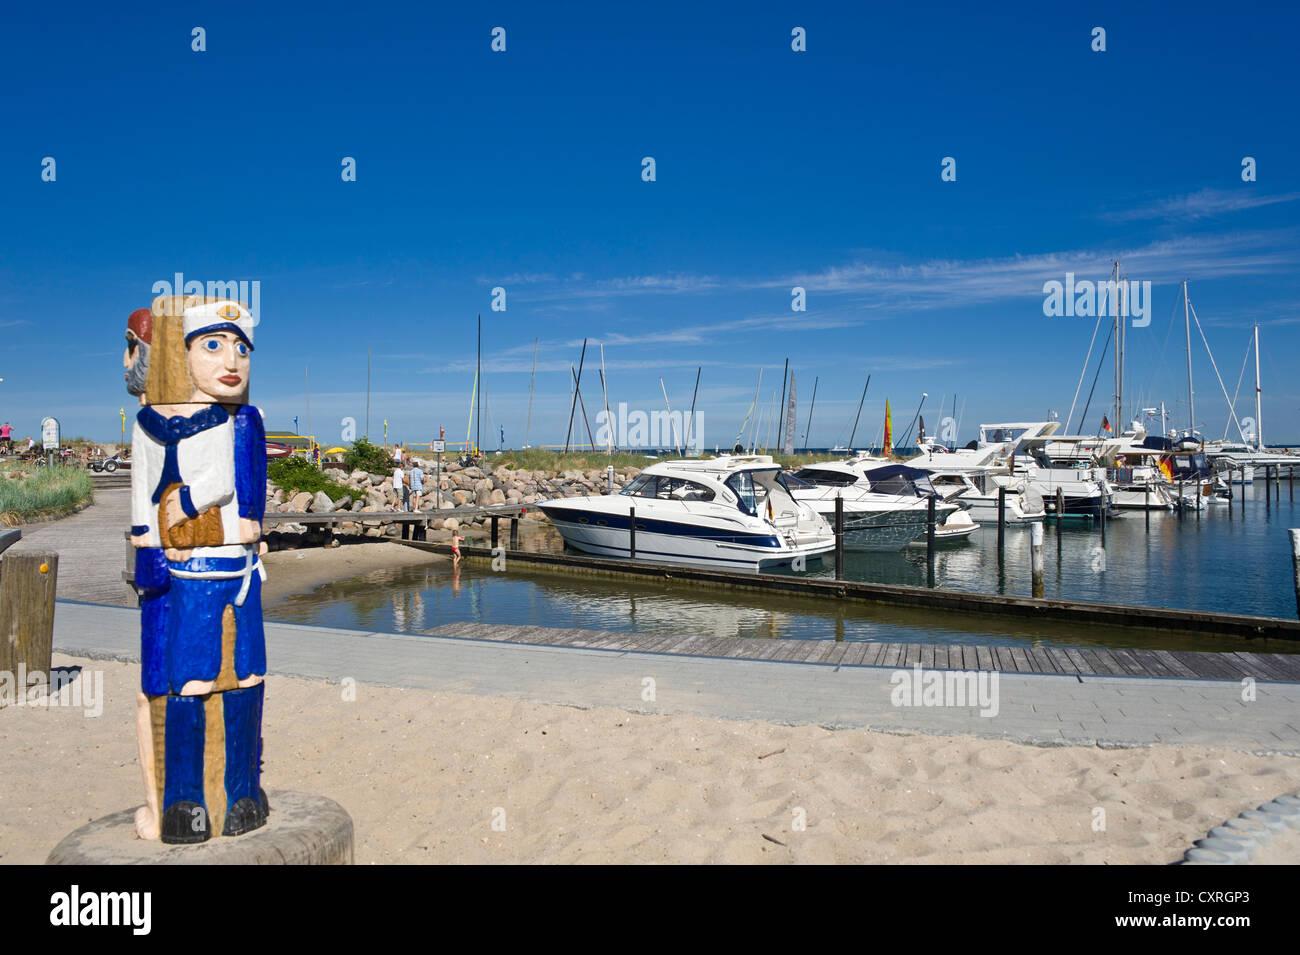 Sailor figure, marina and beach, Groemitz, Baltic Sea, Schleswig-Holstein, Germany, Europe - Stock Image